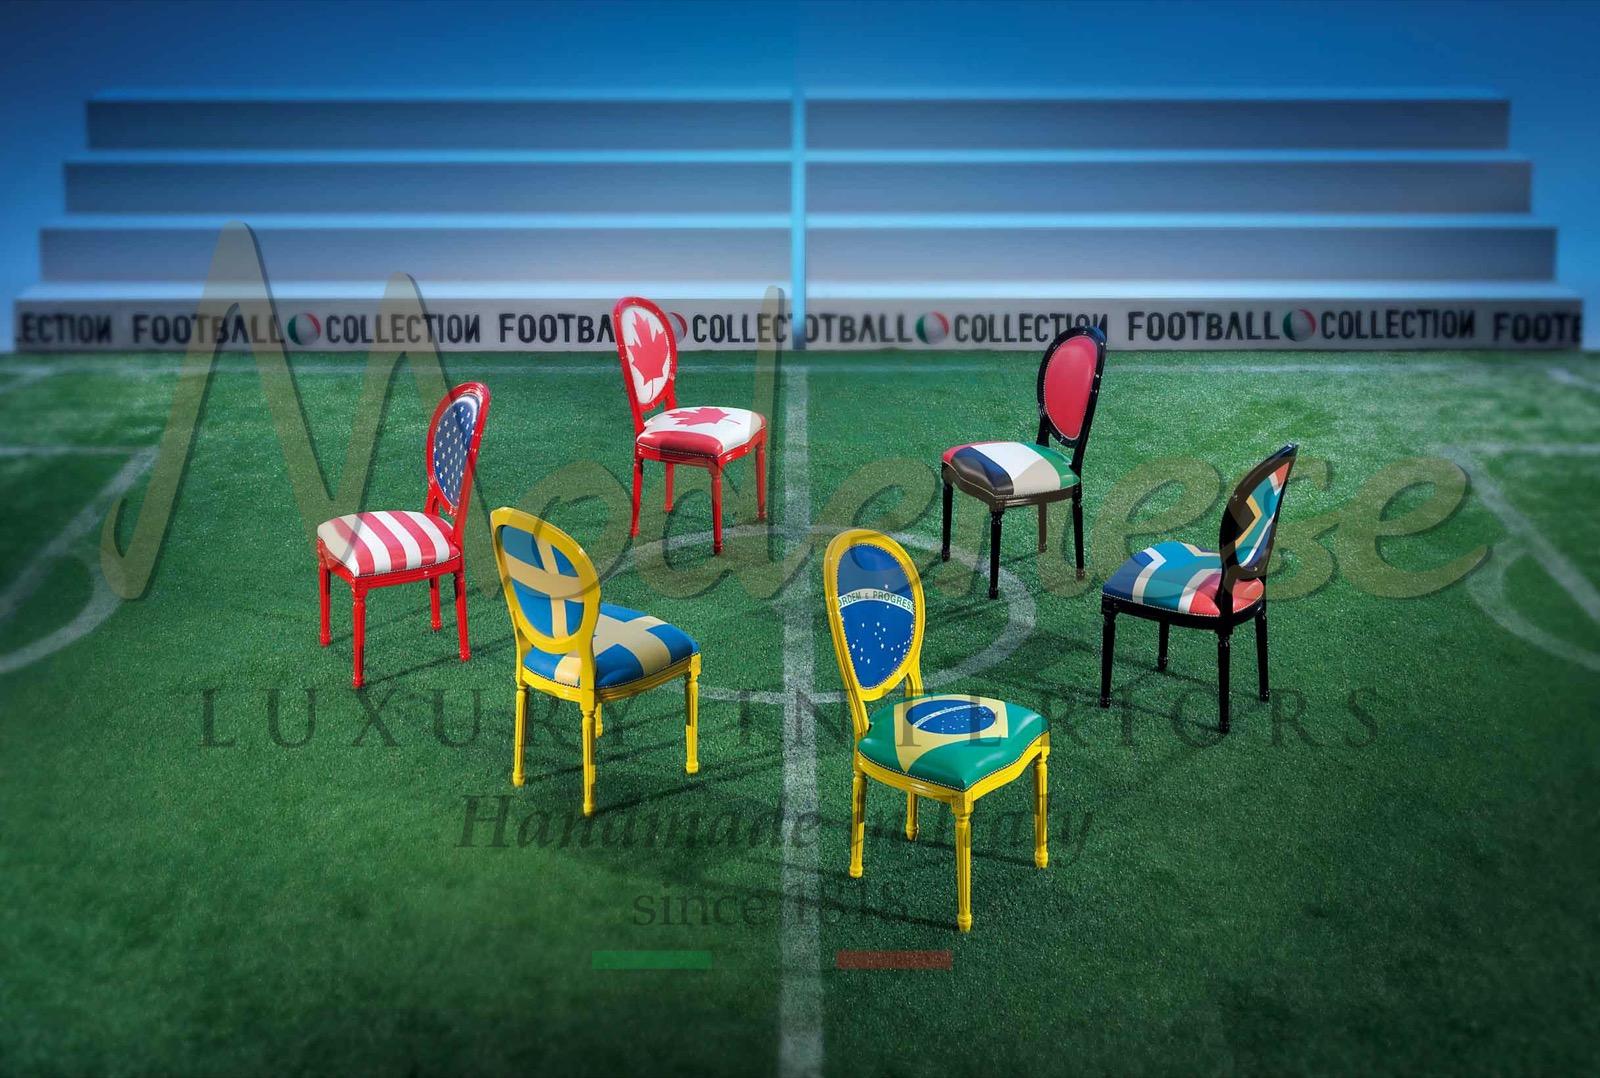 football team colors design armchair sofa cabinet stools entertainment luxury room Italian furniture championship